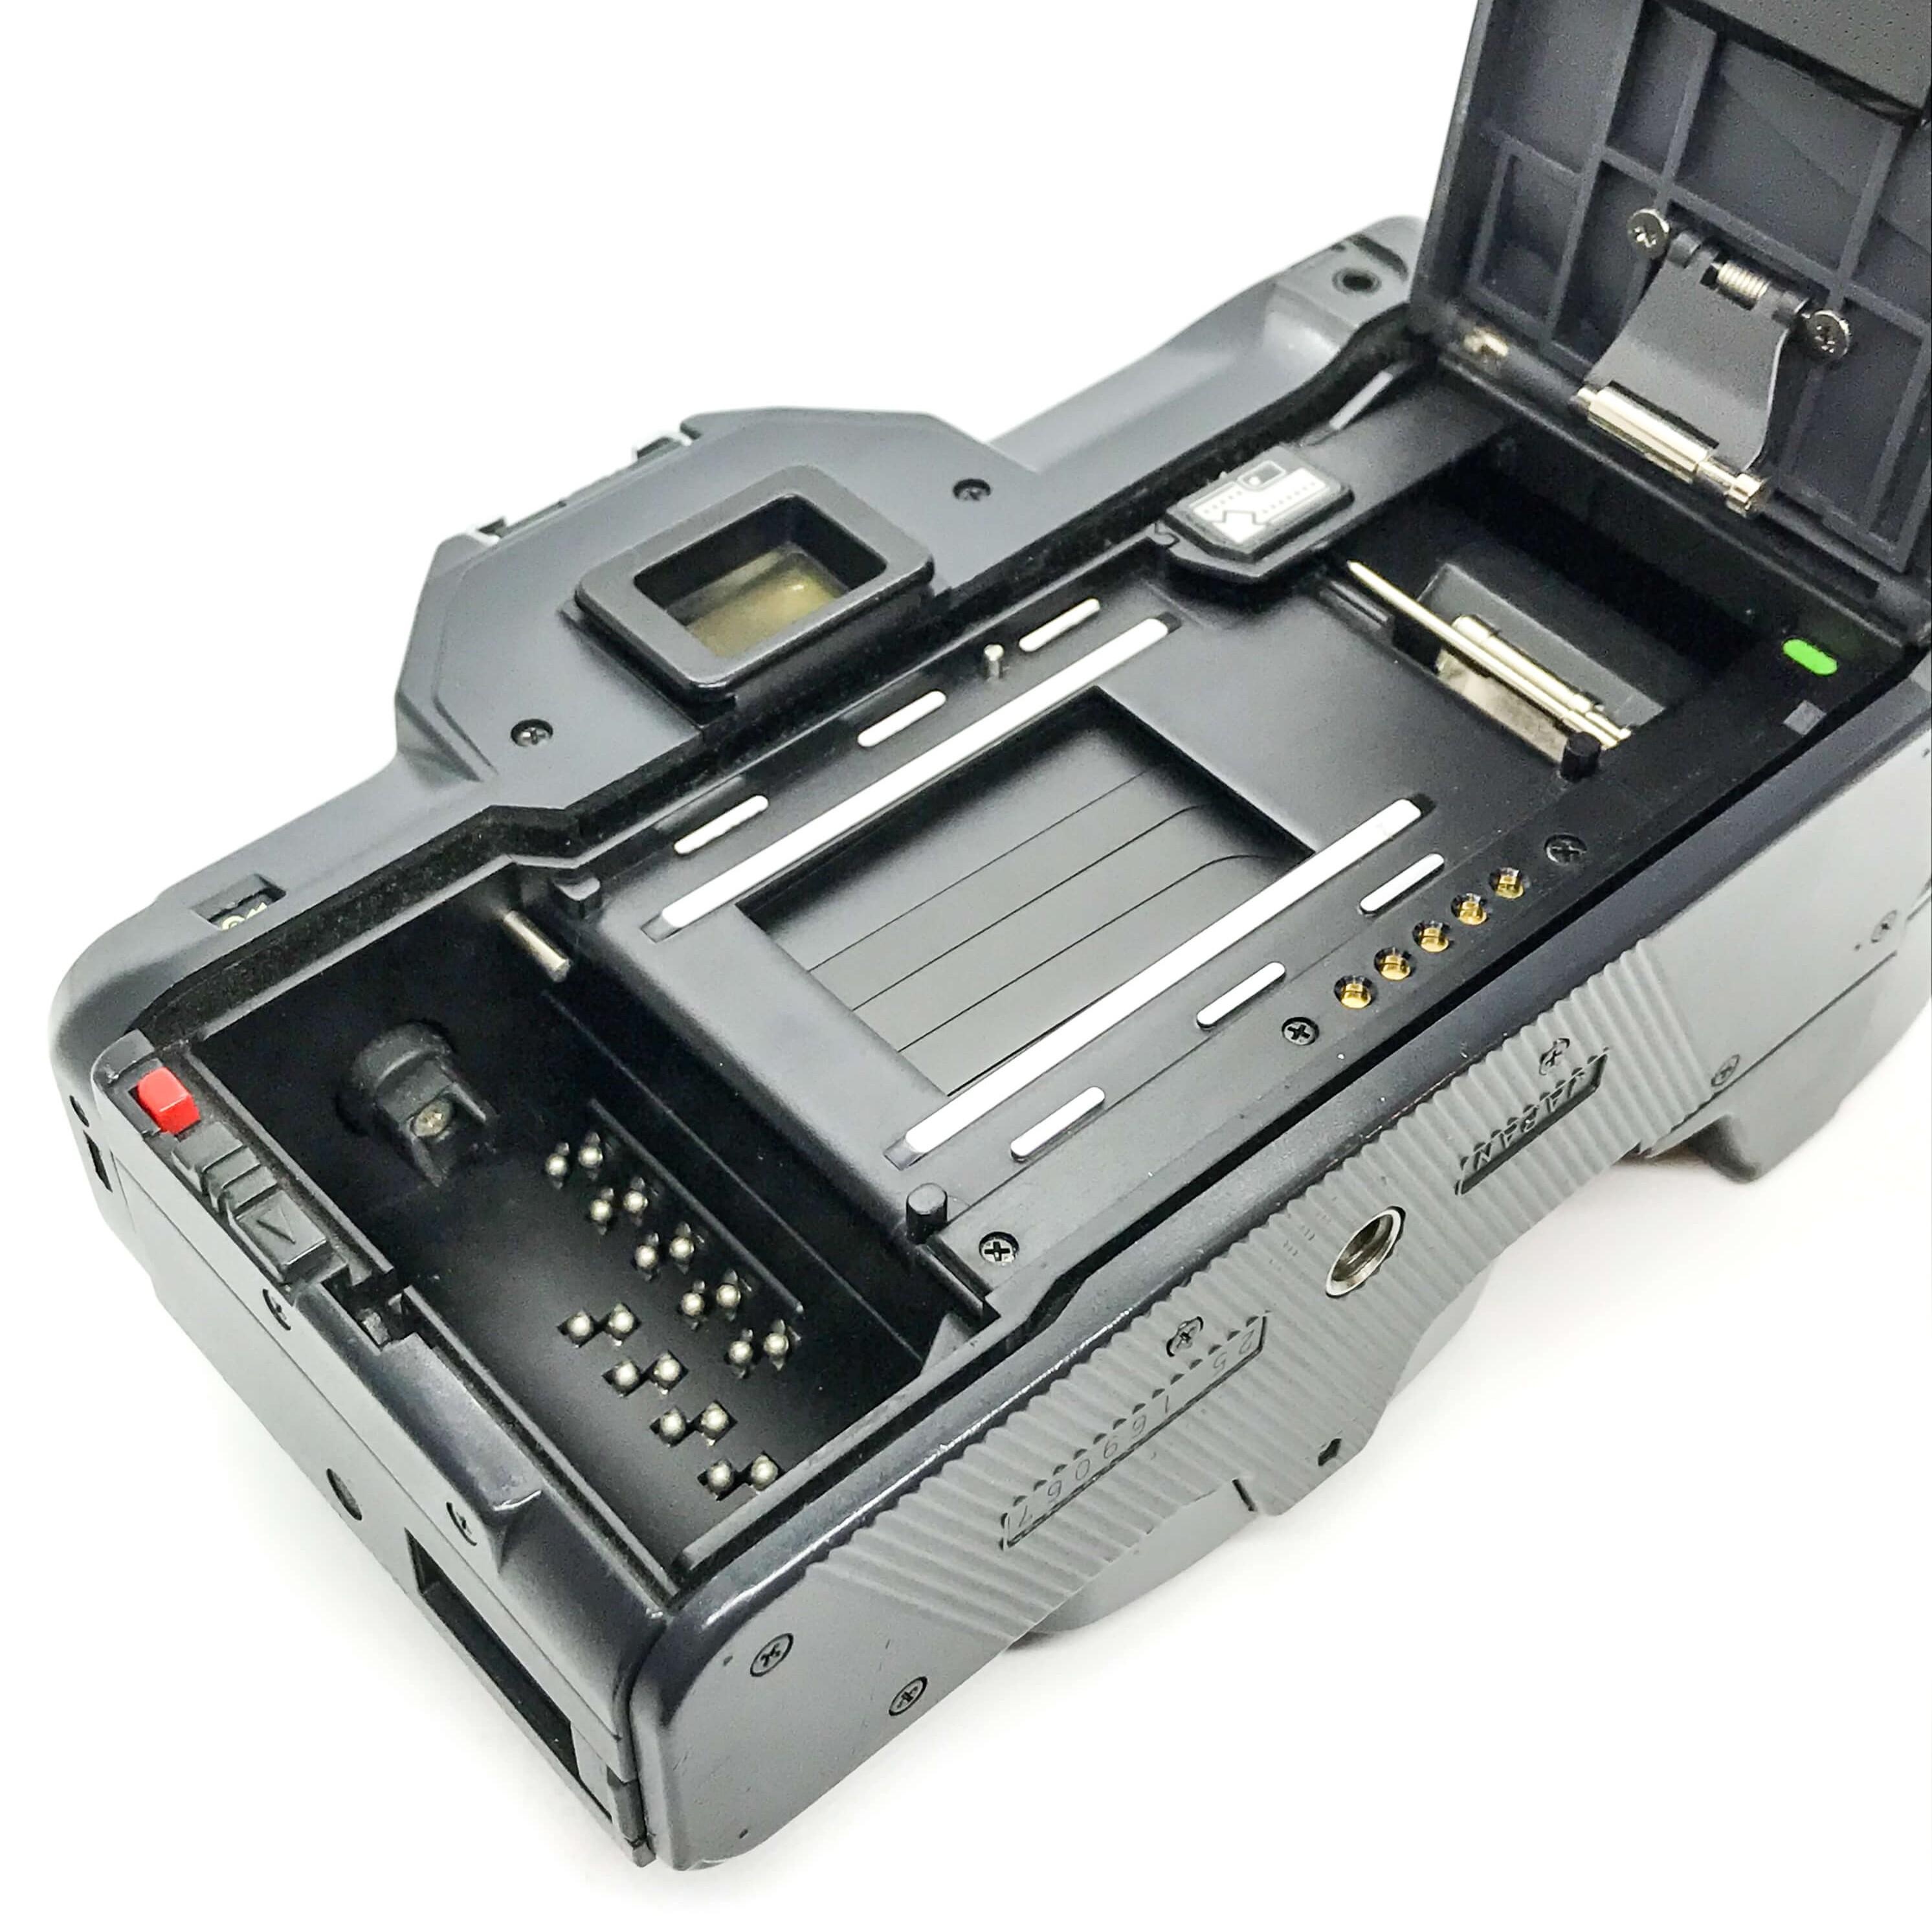 Ricoh XR-X Film SLR Camera